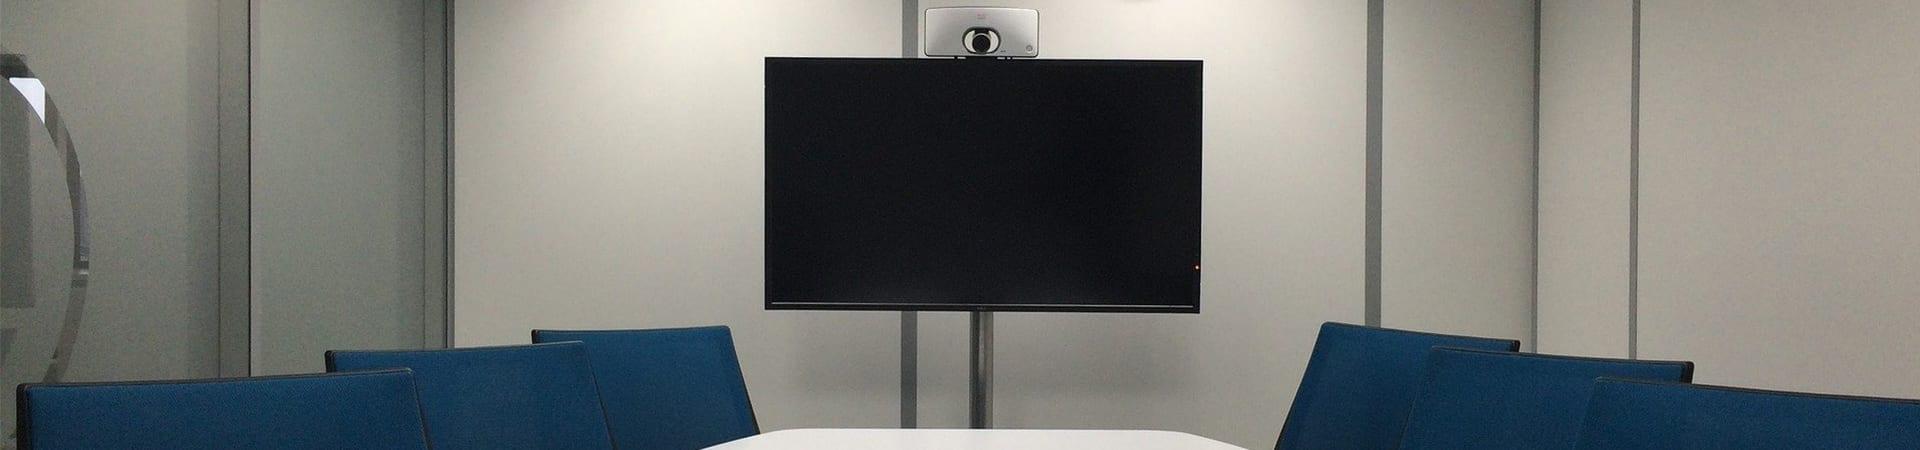 Audio- en videoconferencing - Heuvelman